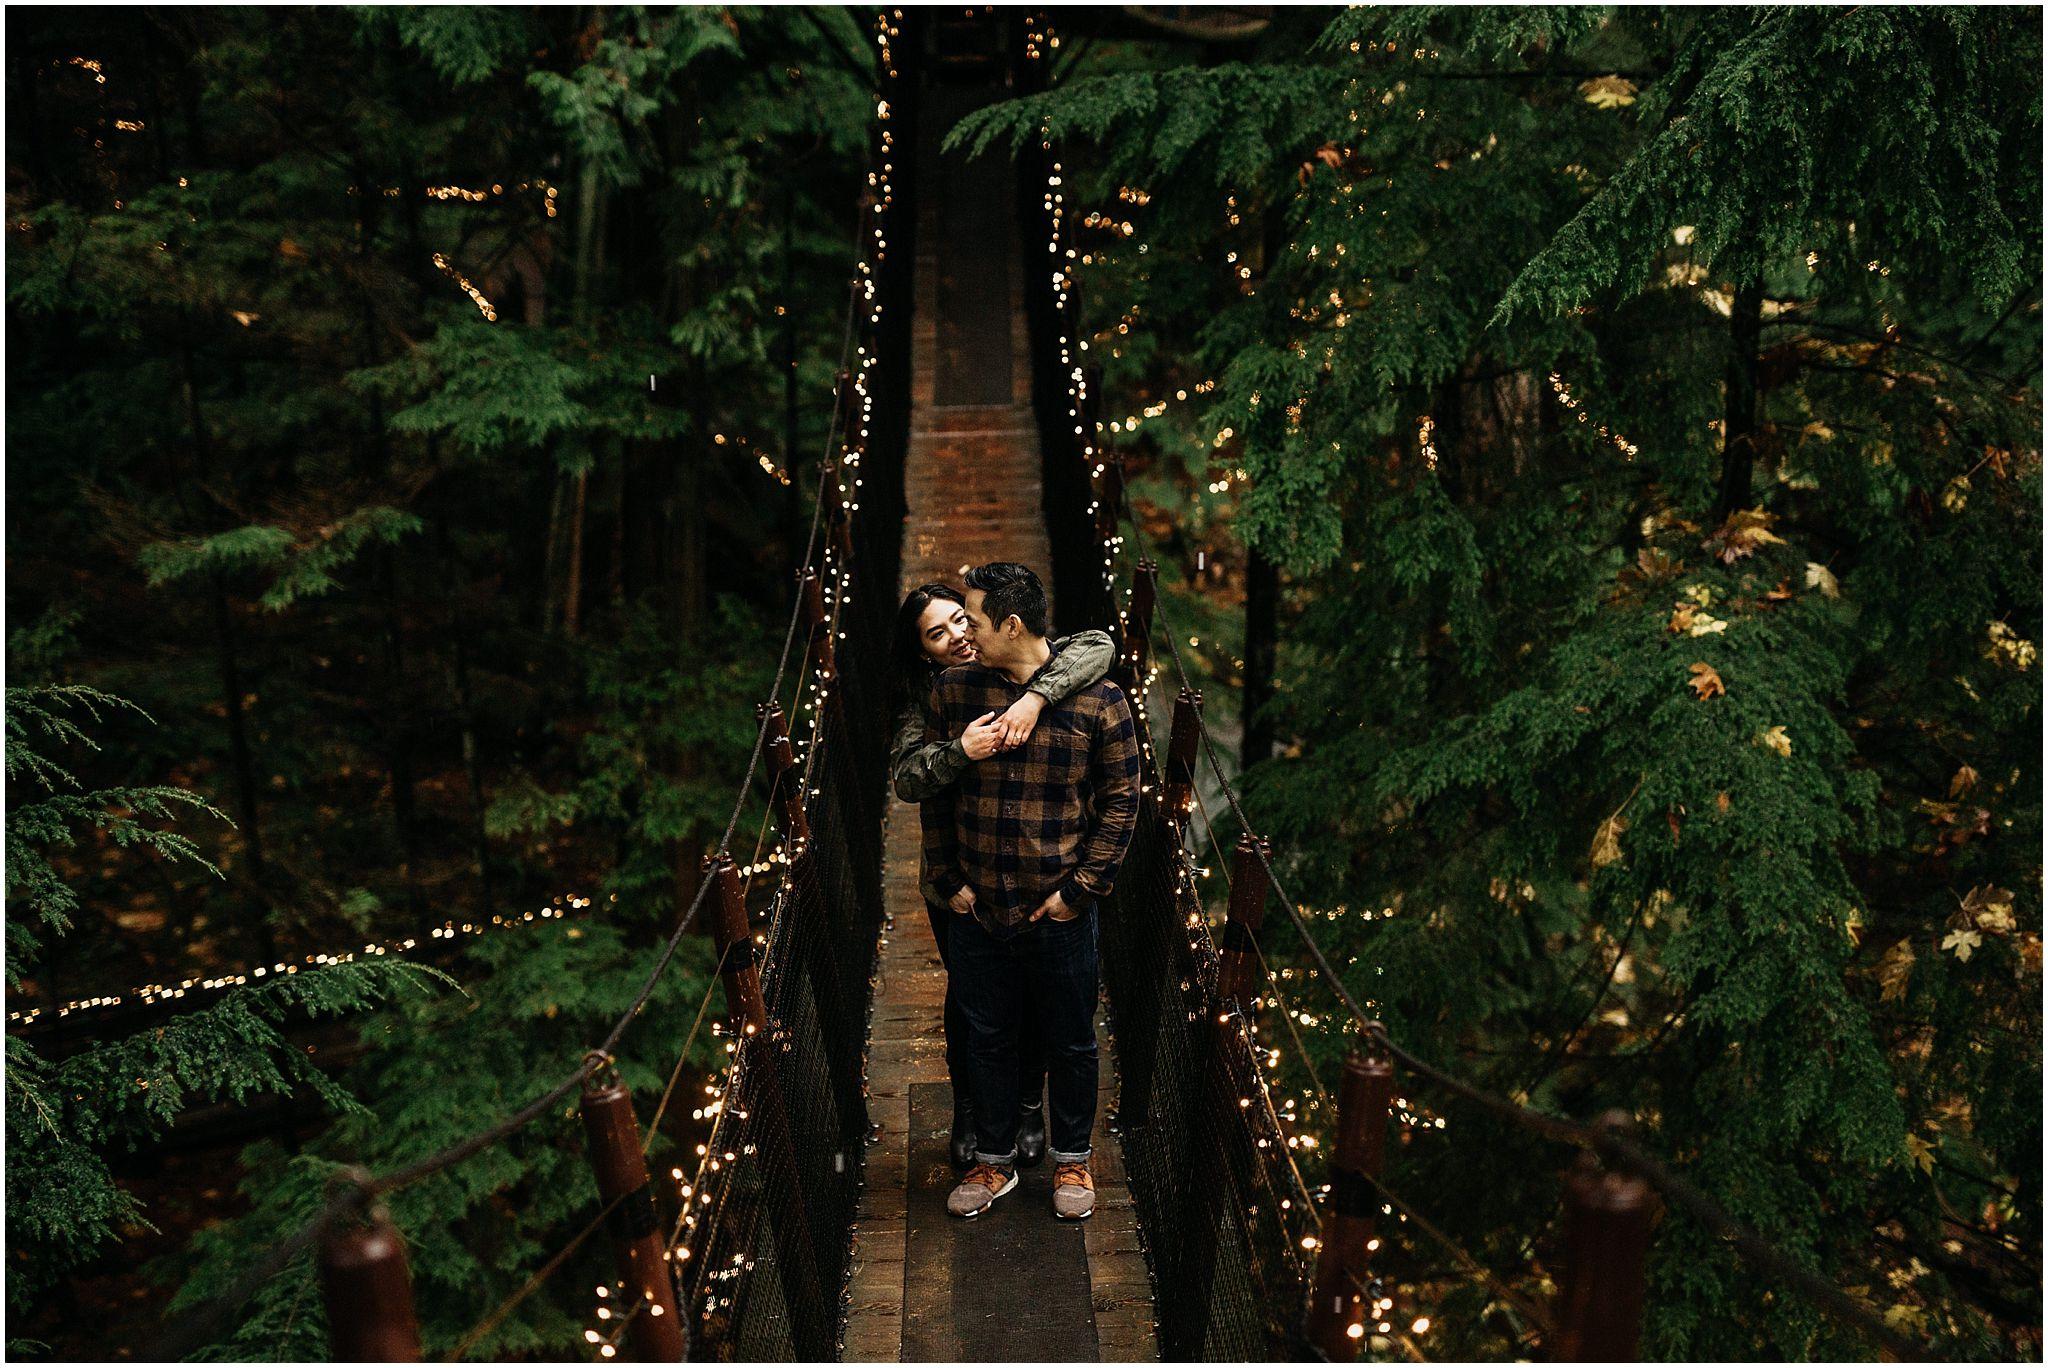 capilano suspension bridge canyon lights couple on bridge hugging